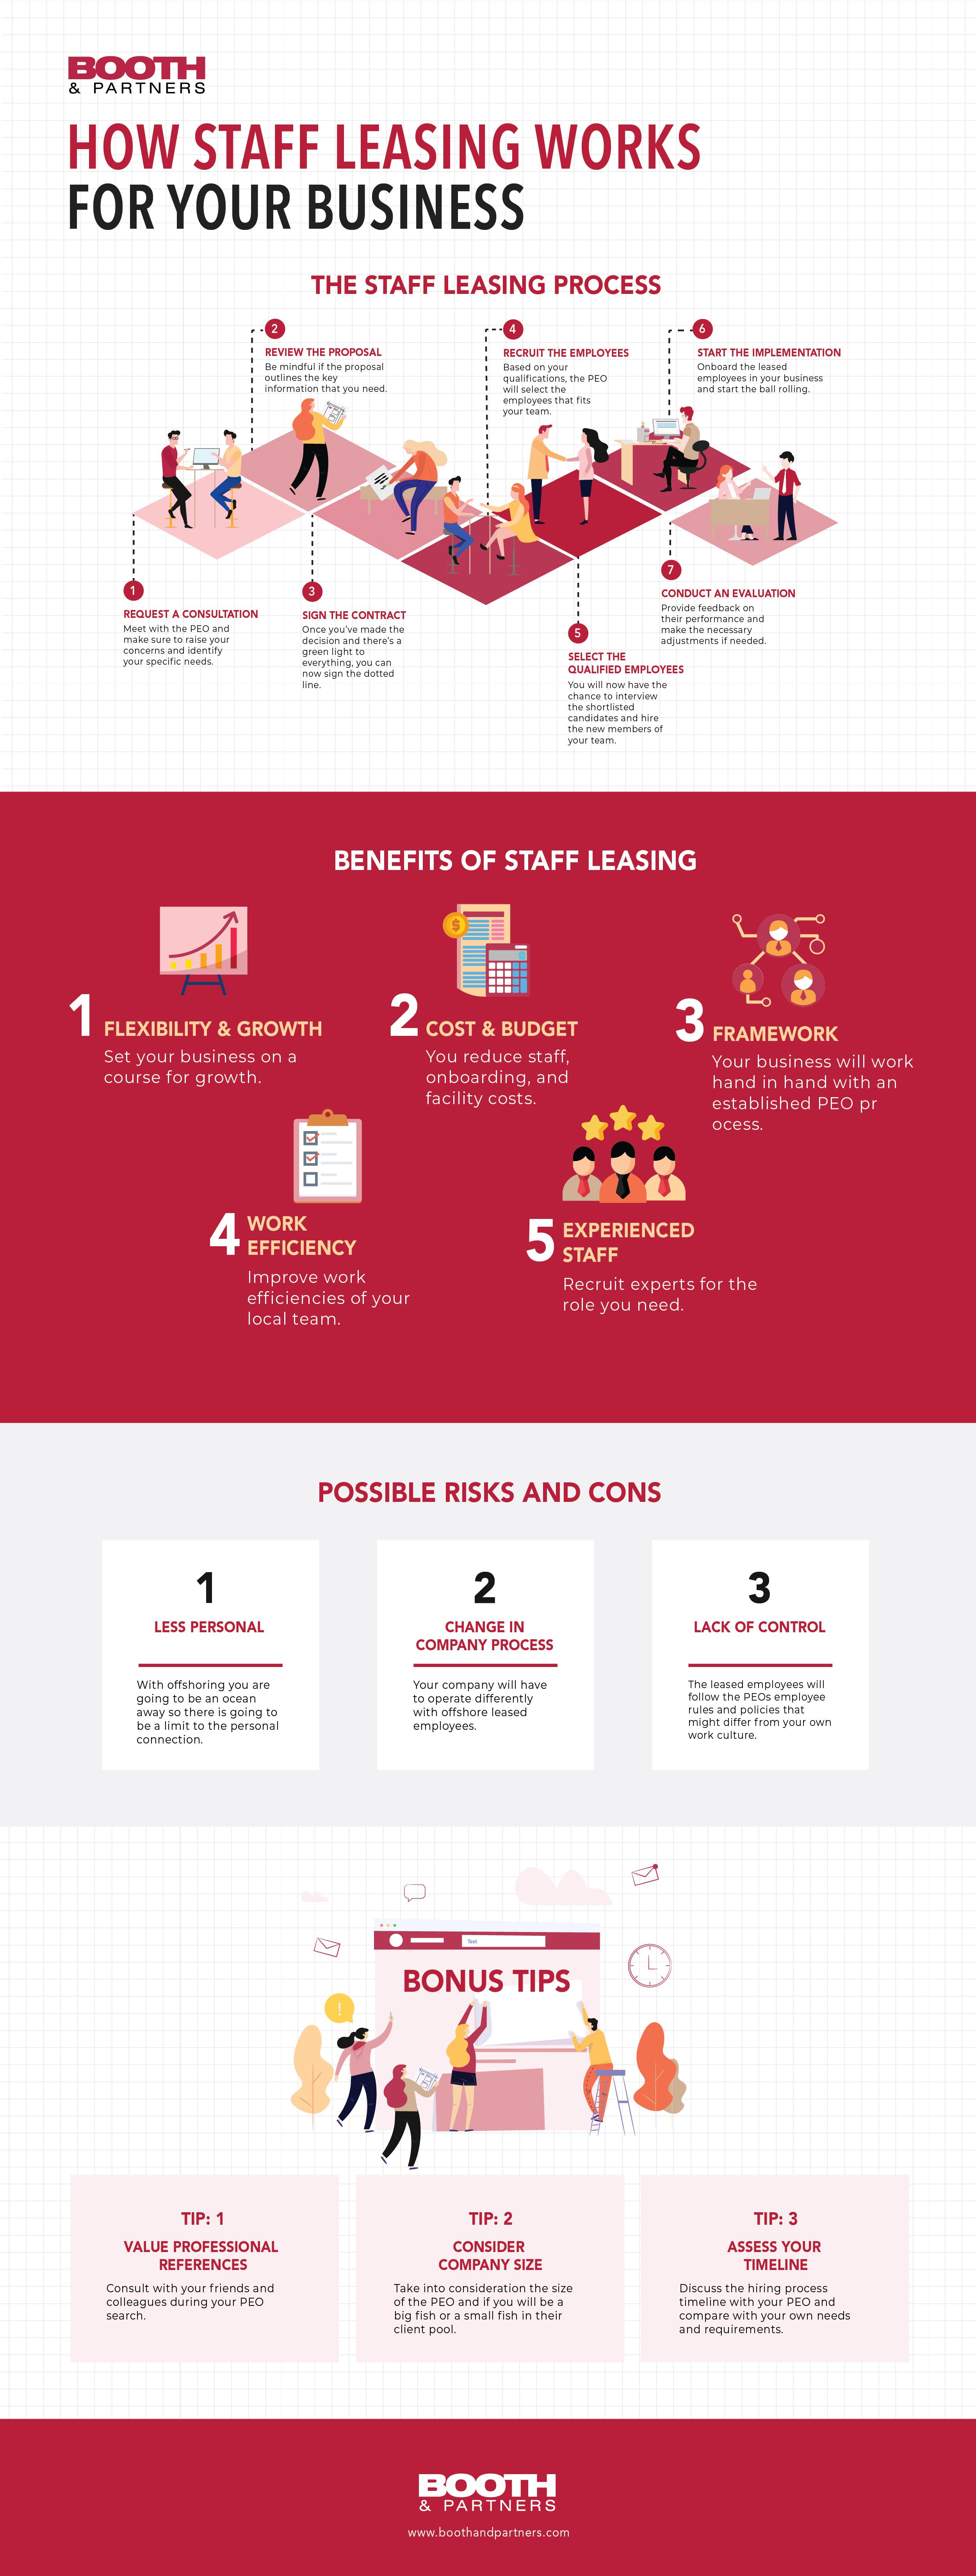 Staff-Leasing-Infog - Do Better Hiring - The RecruitLoop Blog